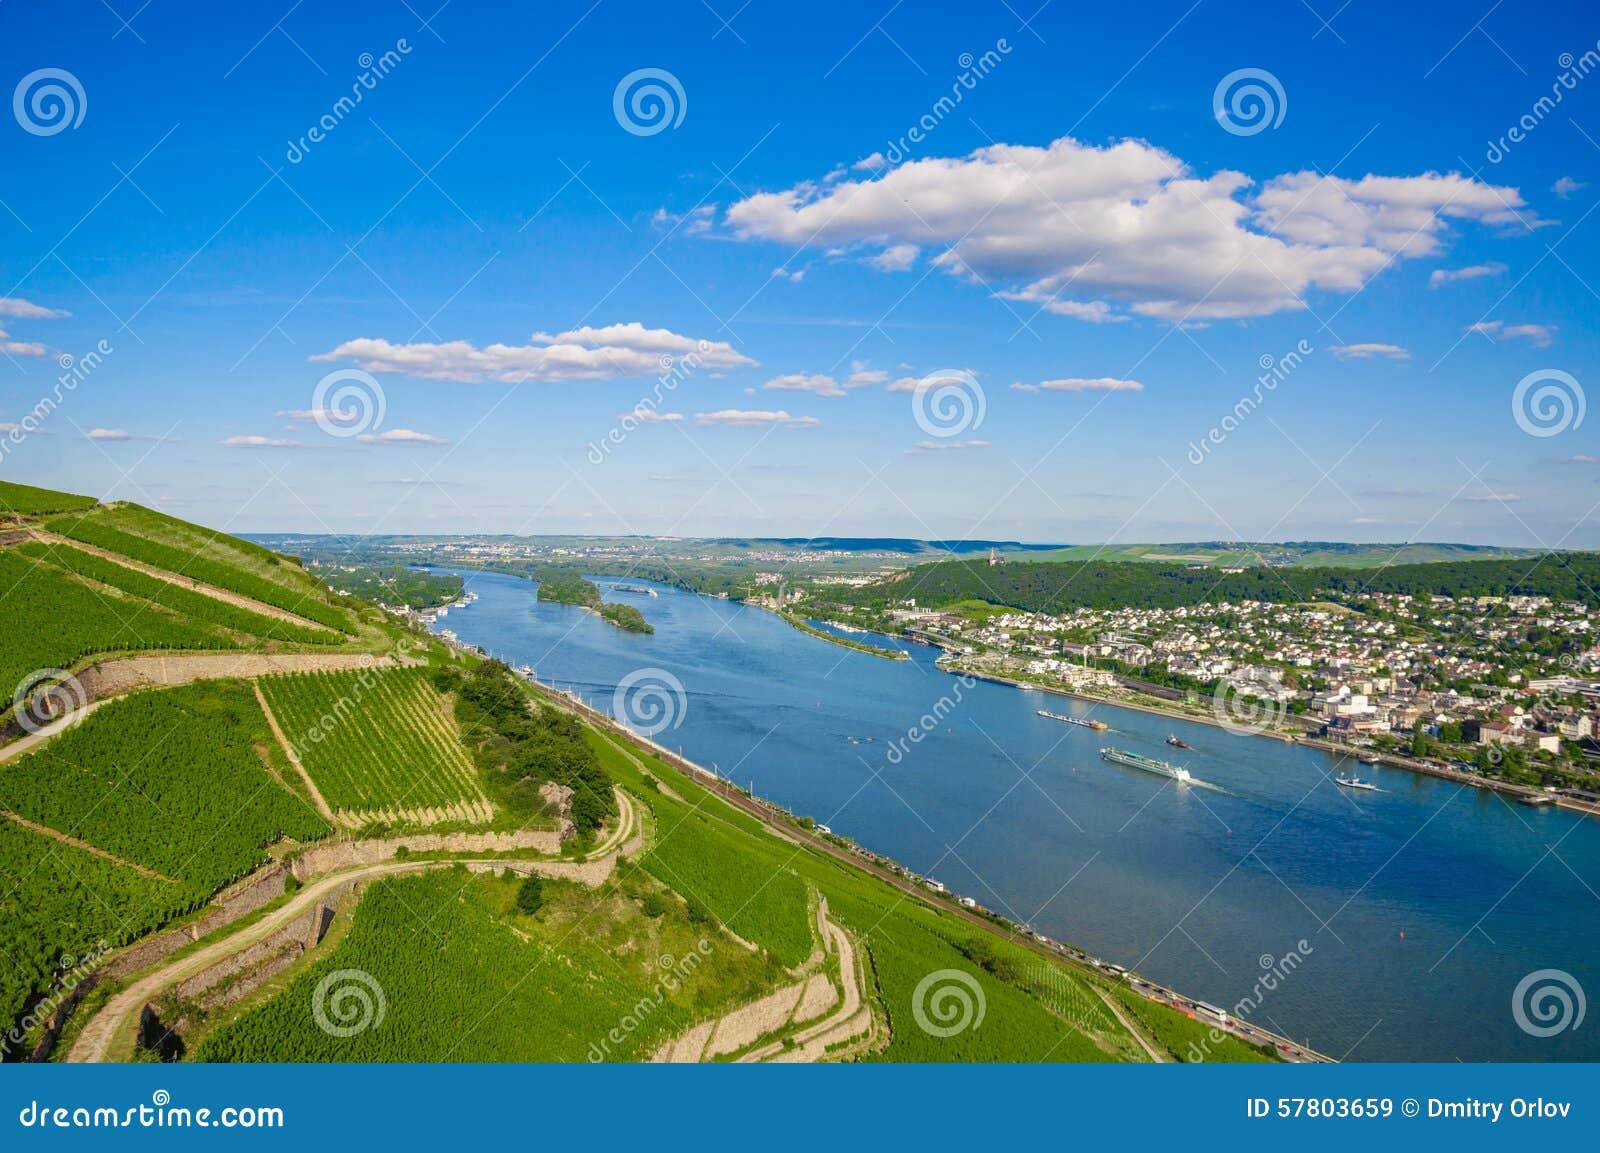 Rhine River perto de Bingen am Rhein, Rheinland-Pfalz, Alemanha